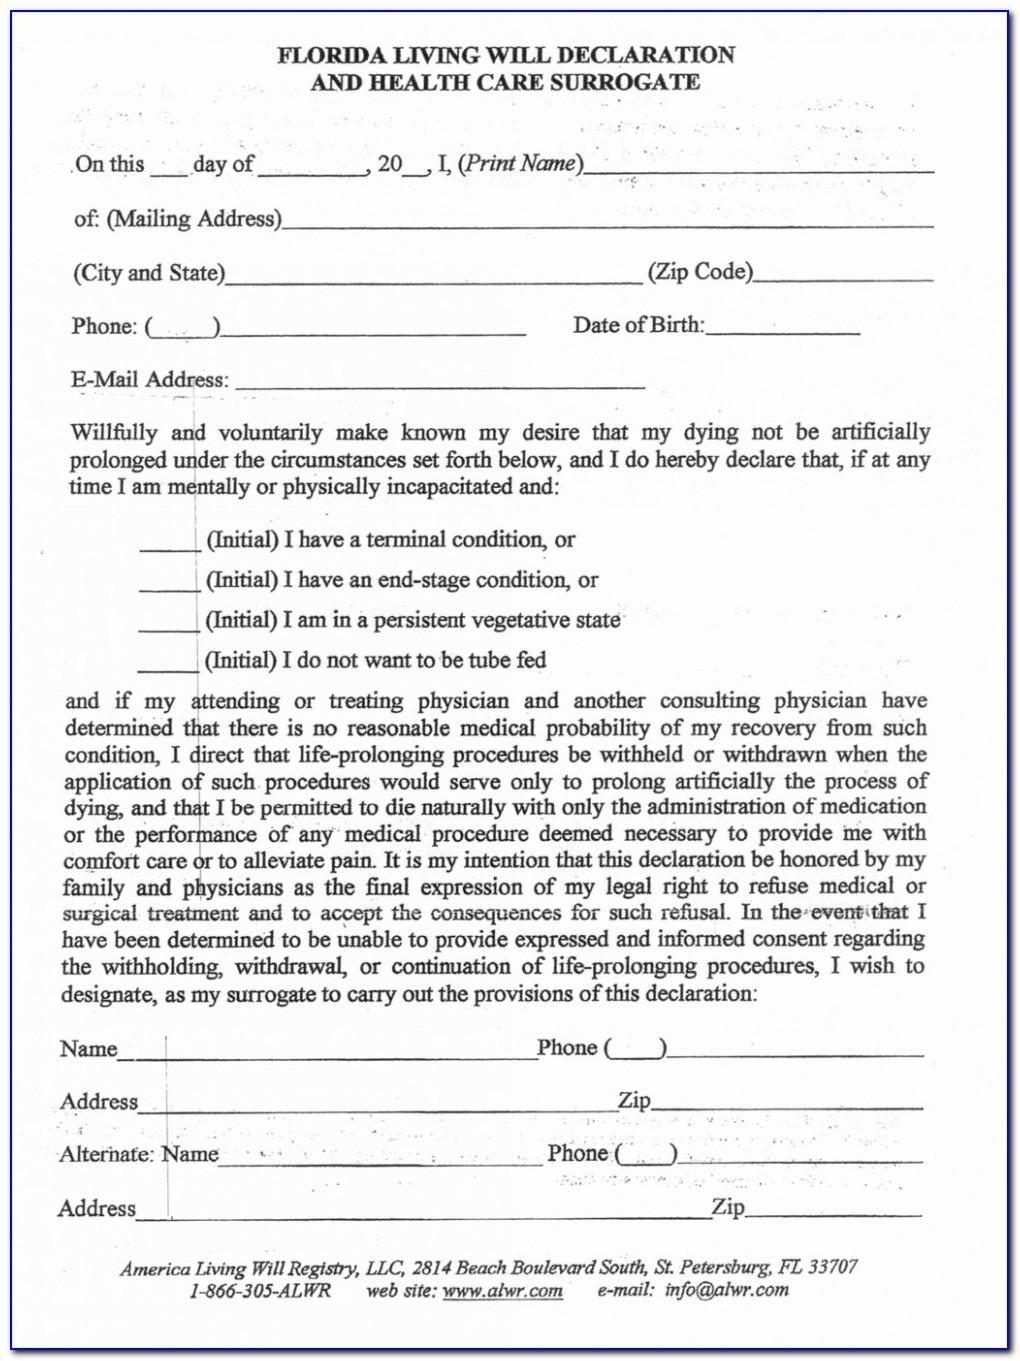 Living Will Declaration Form Florida